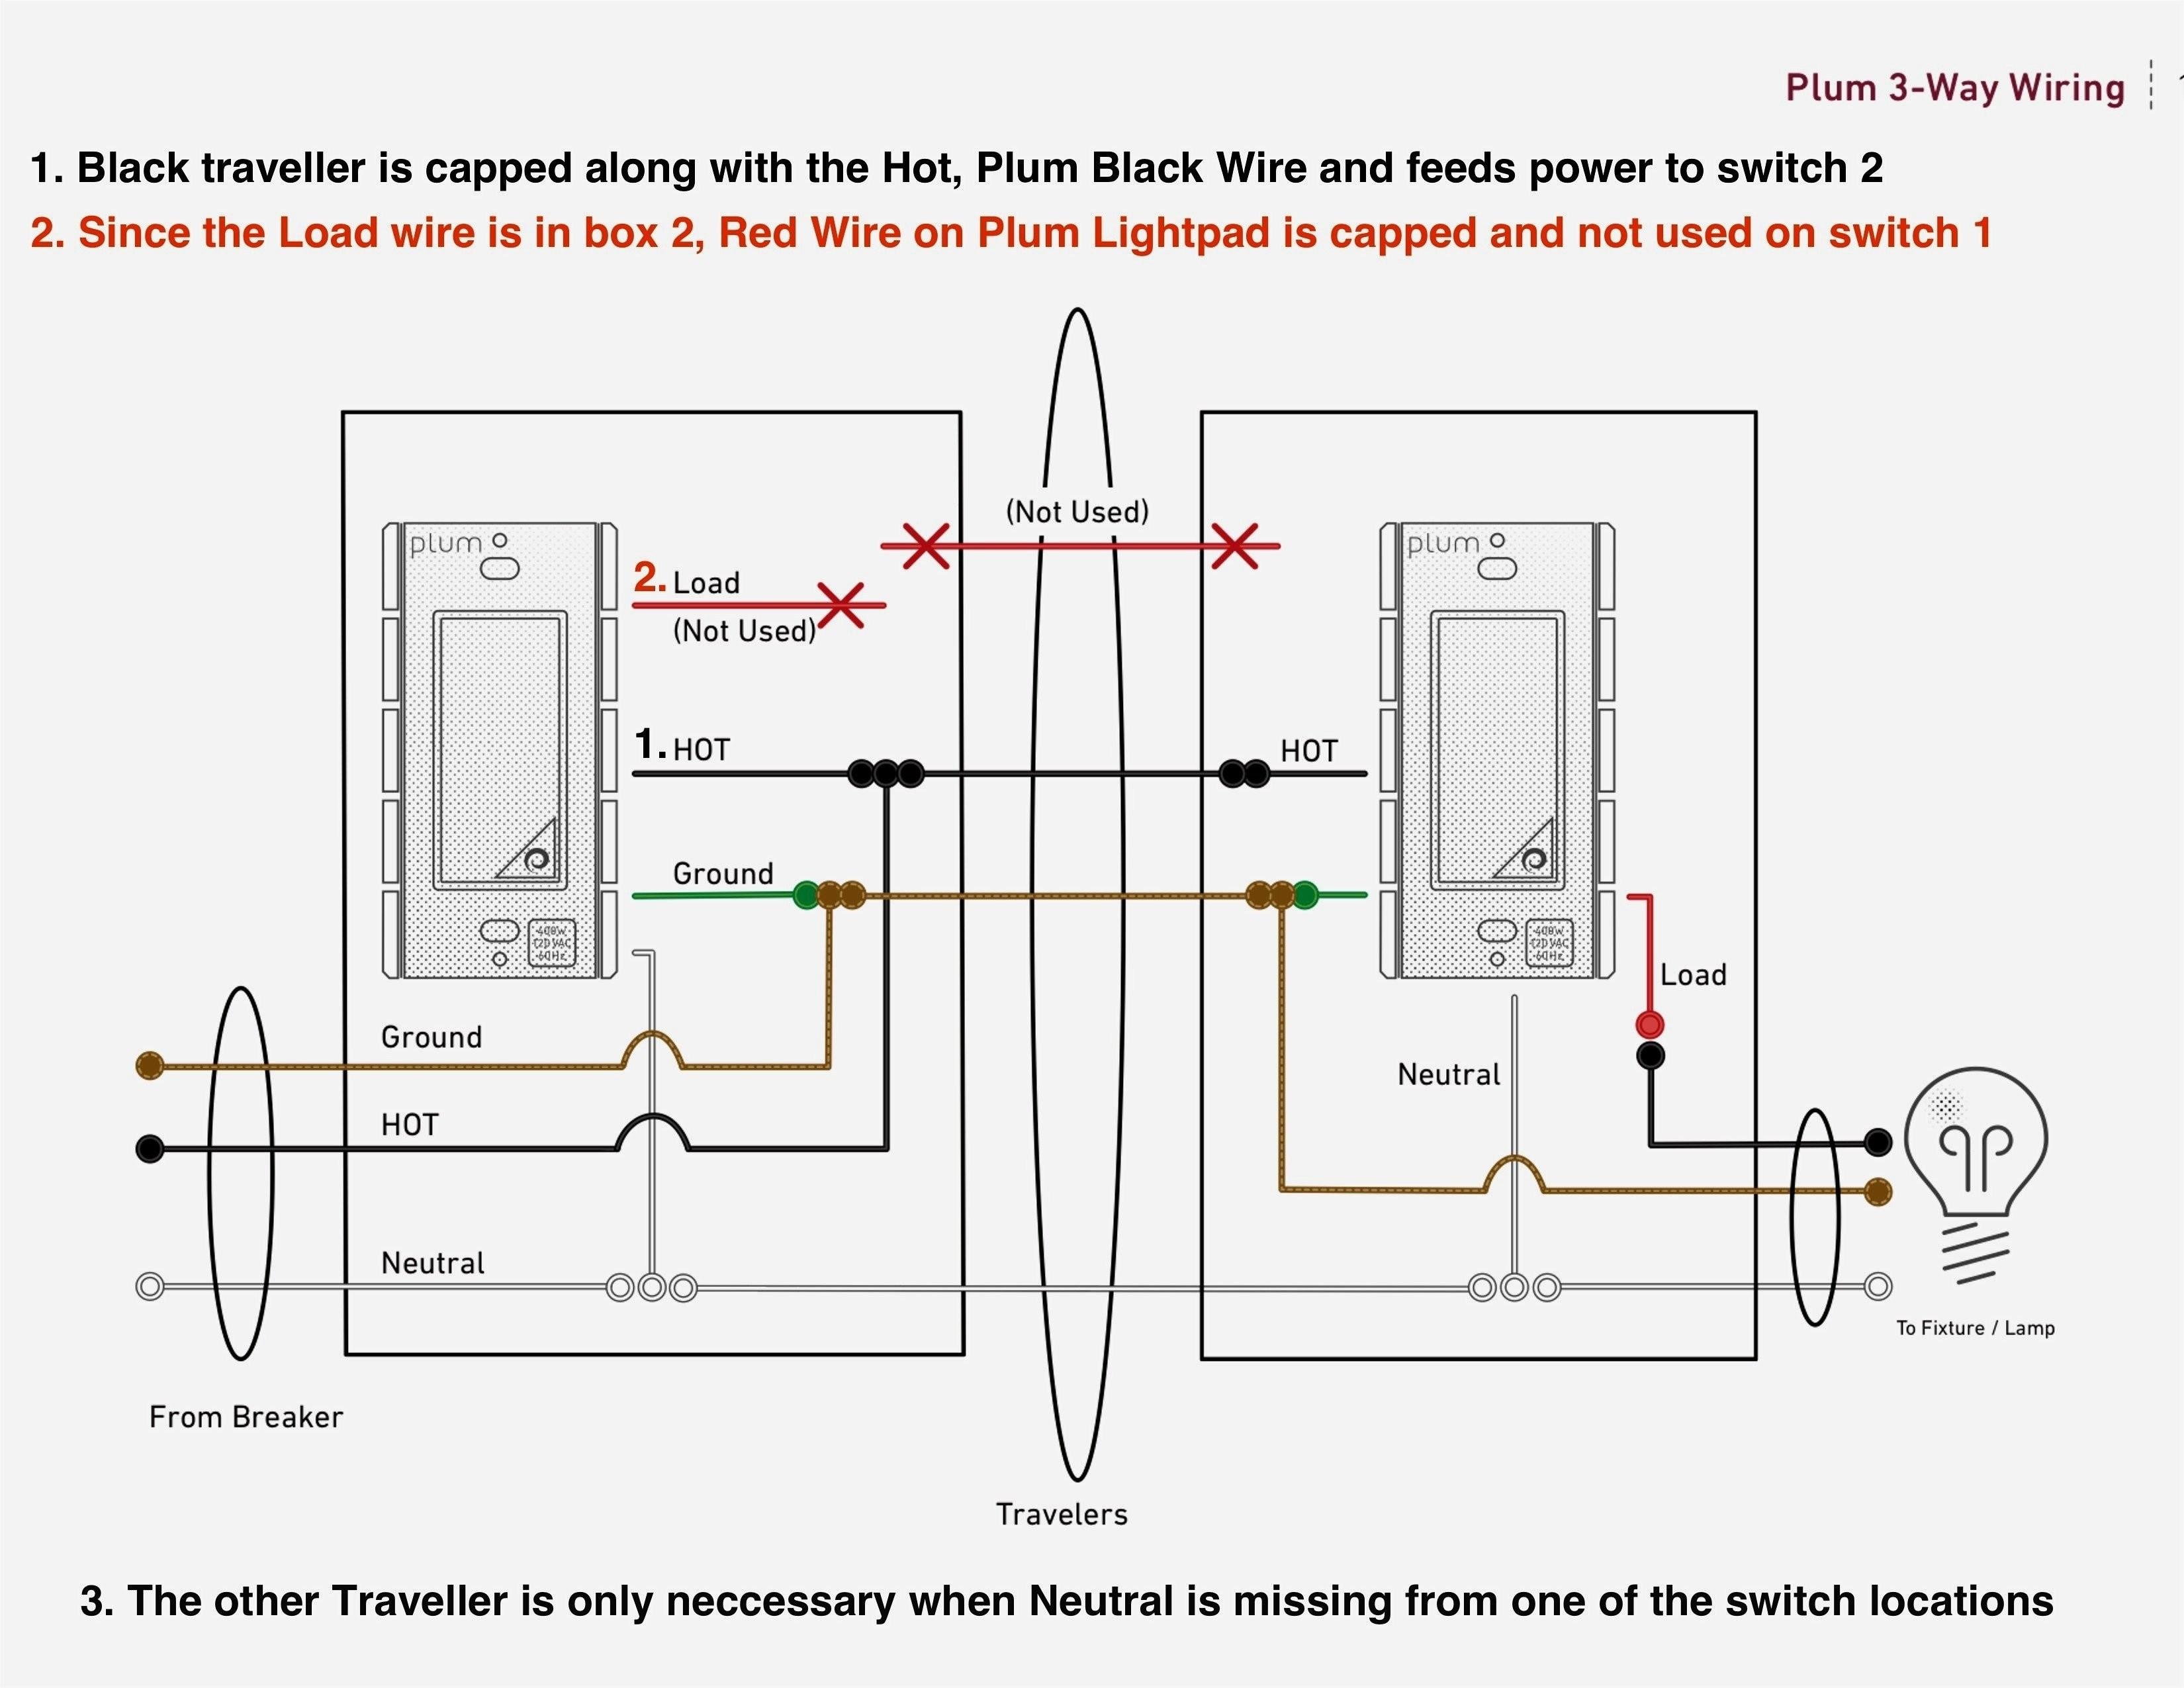 Leviton Switch Wiring Diagram Awesome Lutron 3 Way Dimmer Switch Valid Wiring Diagram for Dimmer